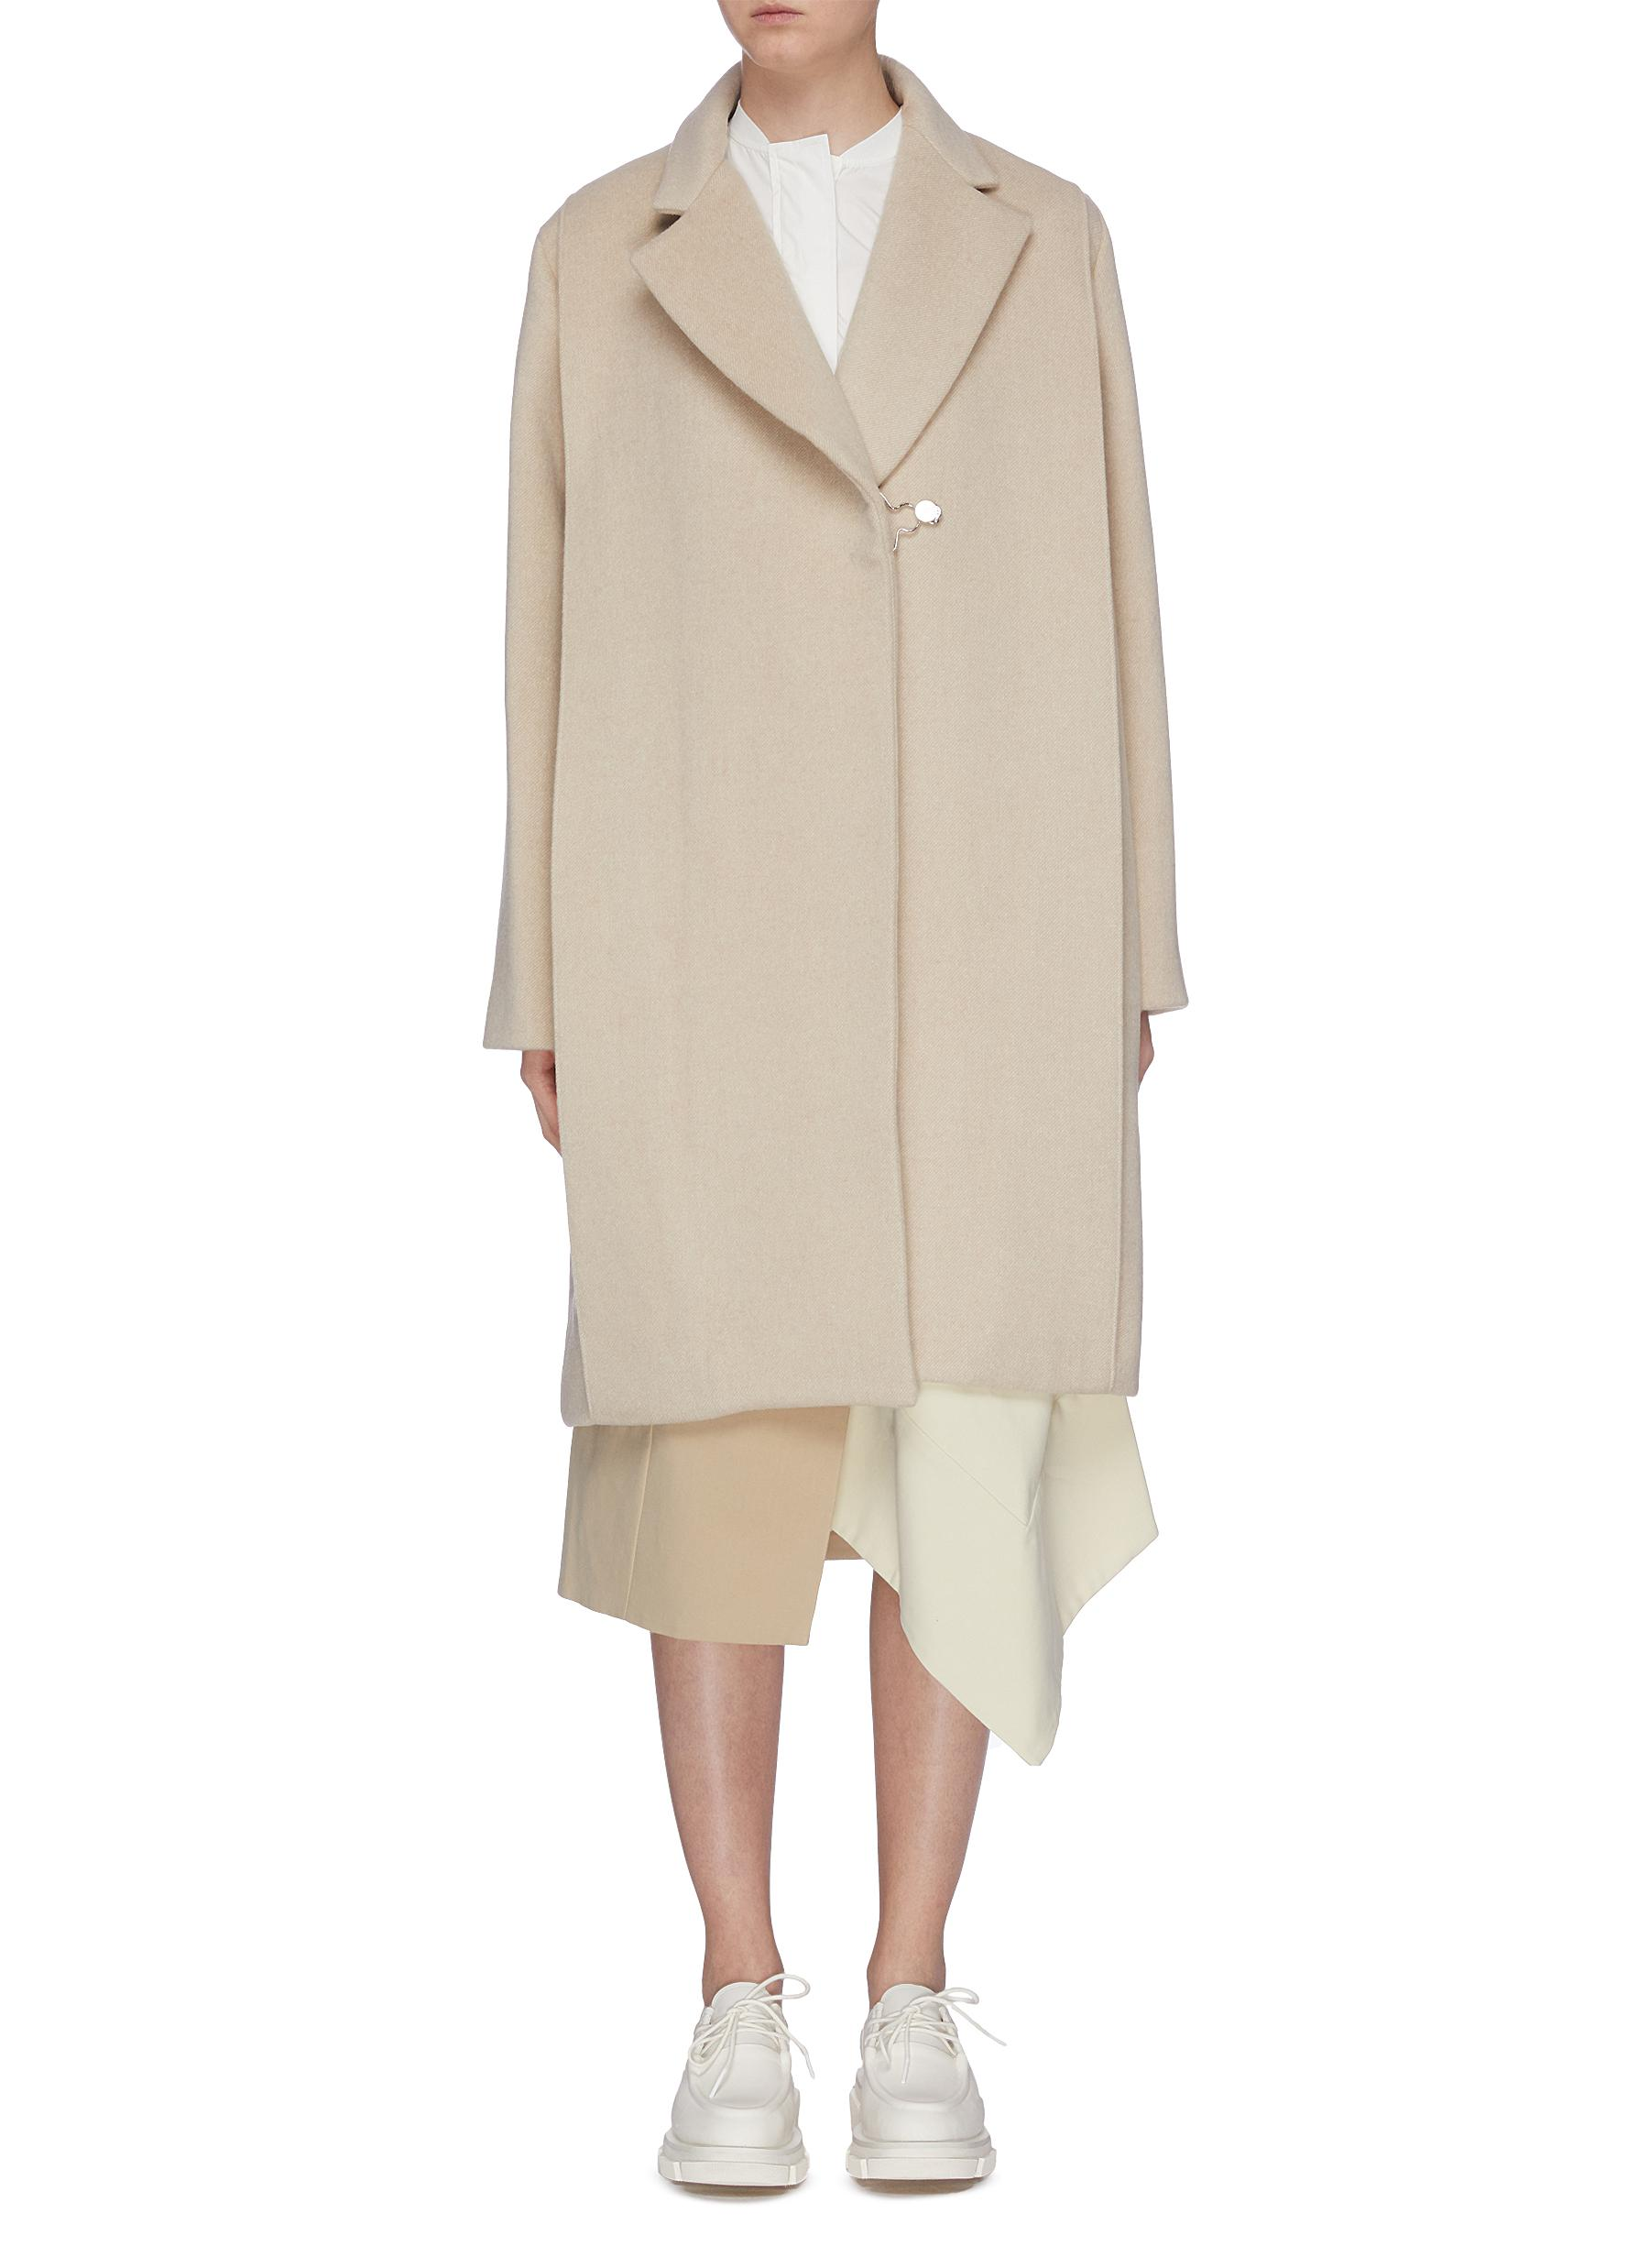 Metallic clasp twill coat by Ffixxed Studios